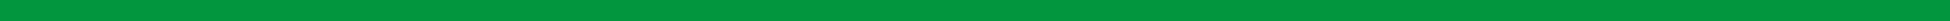 parallax_img_green